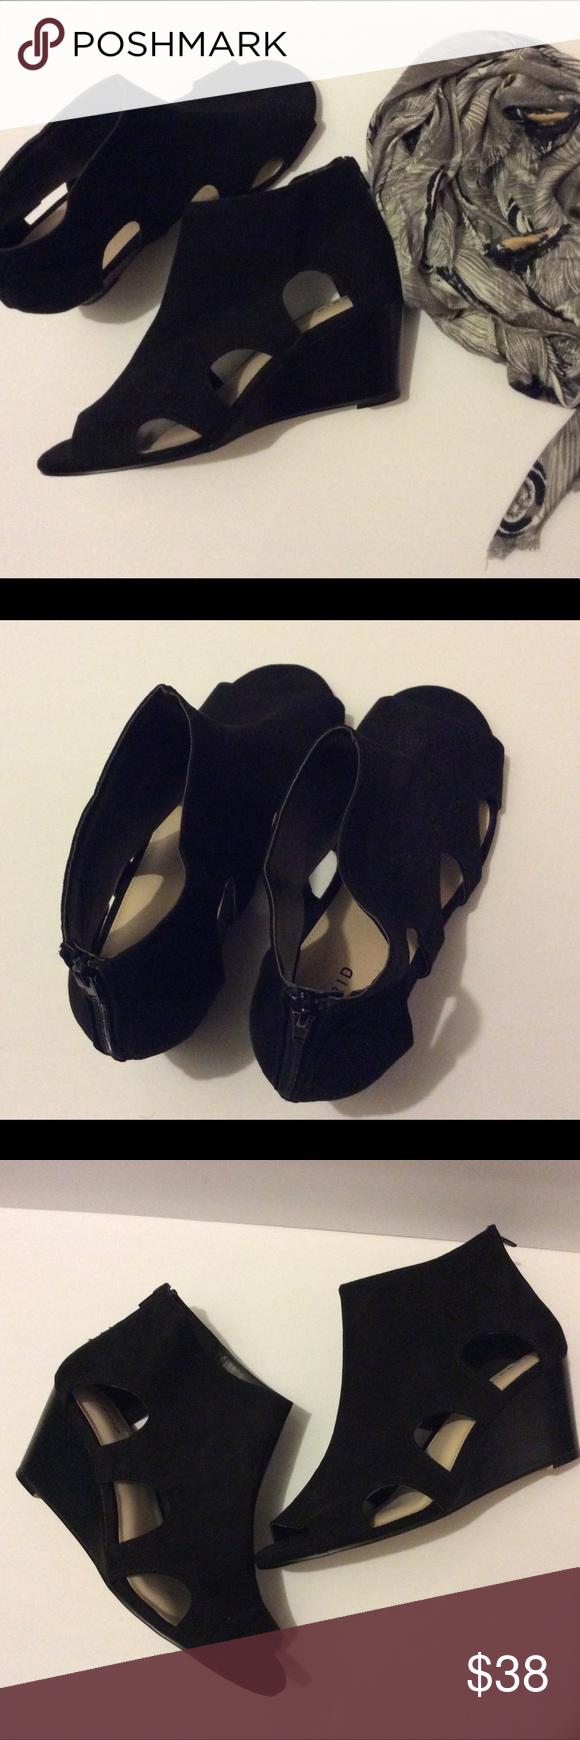 Women's Torrid Cutout Wedge Shoes Size